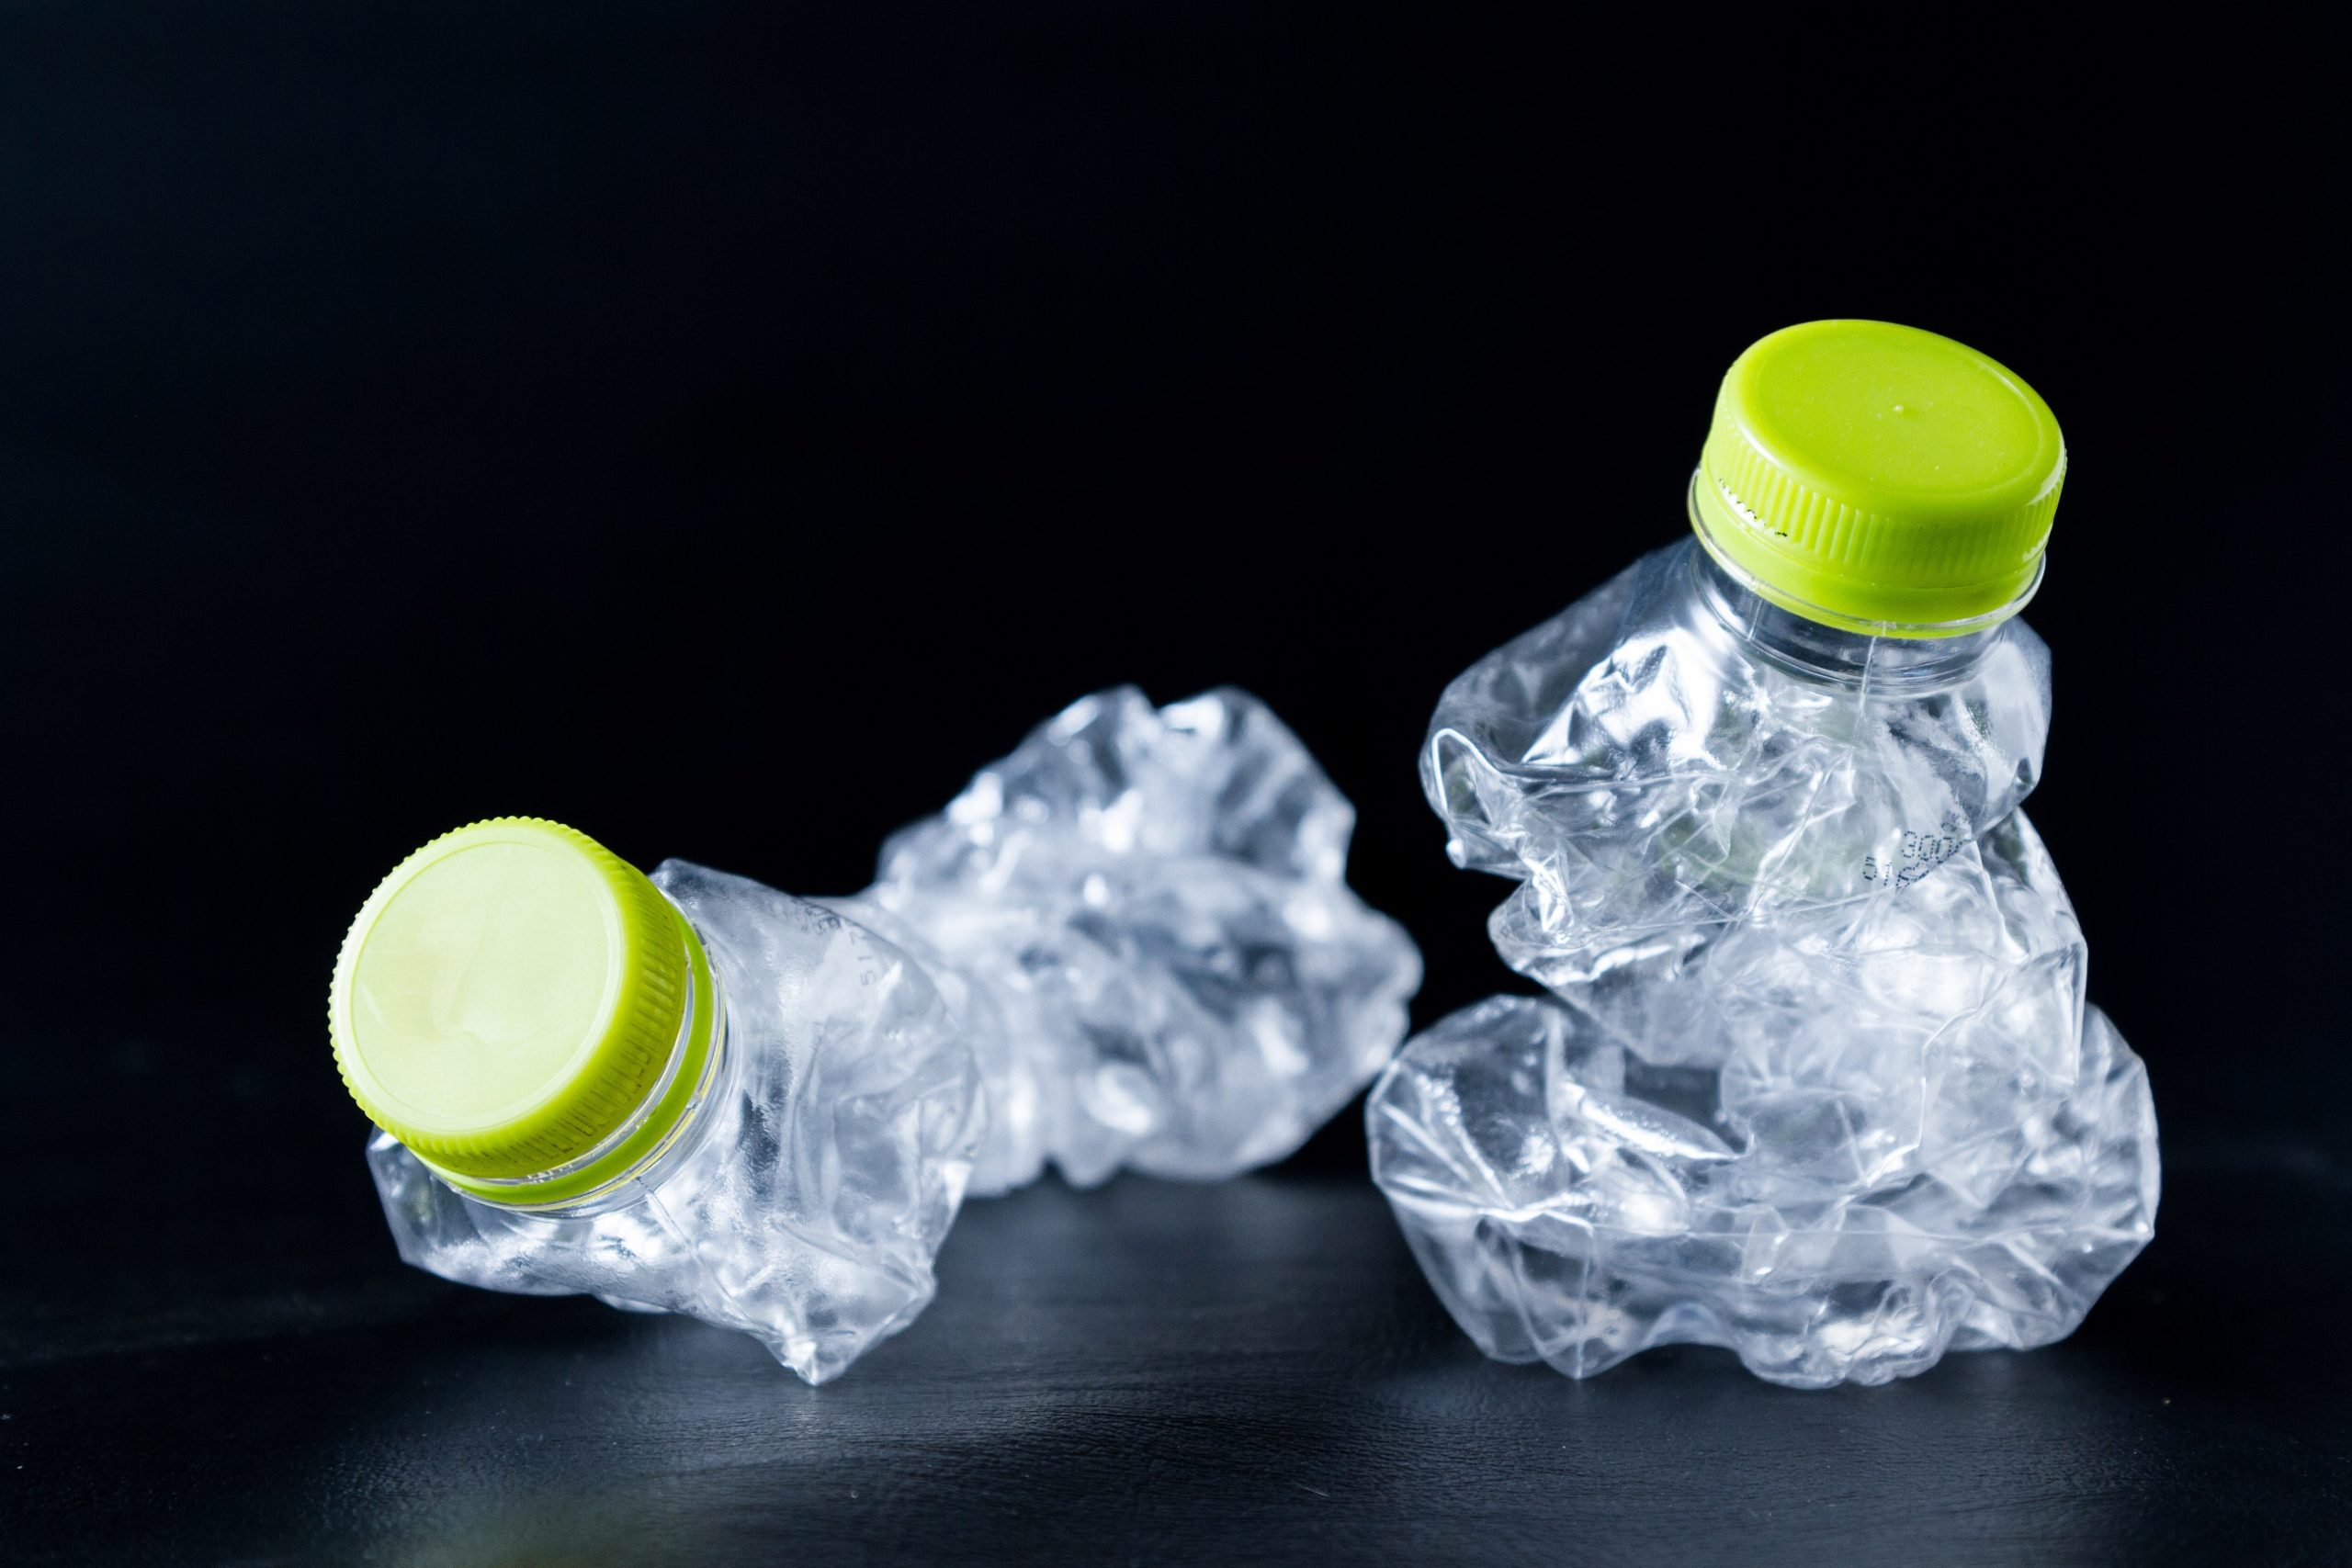 The dangers lurking in bottled water